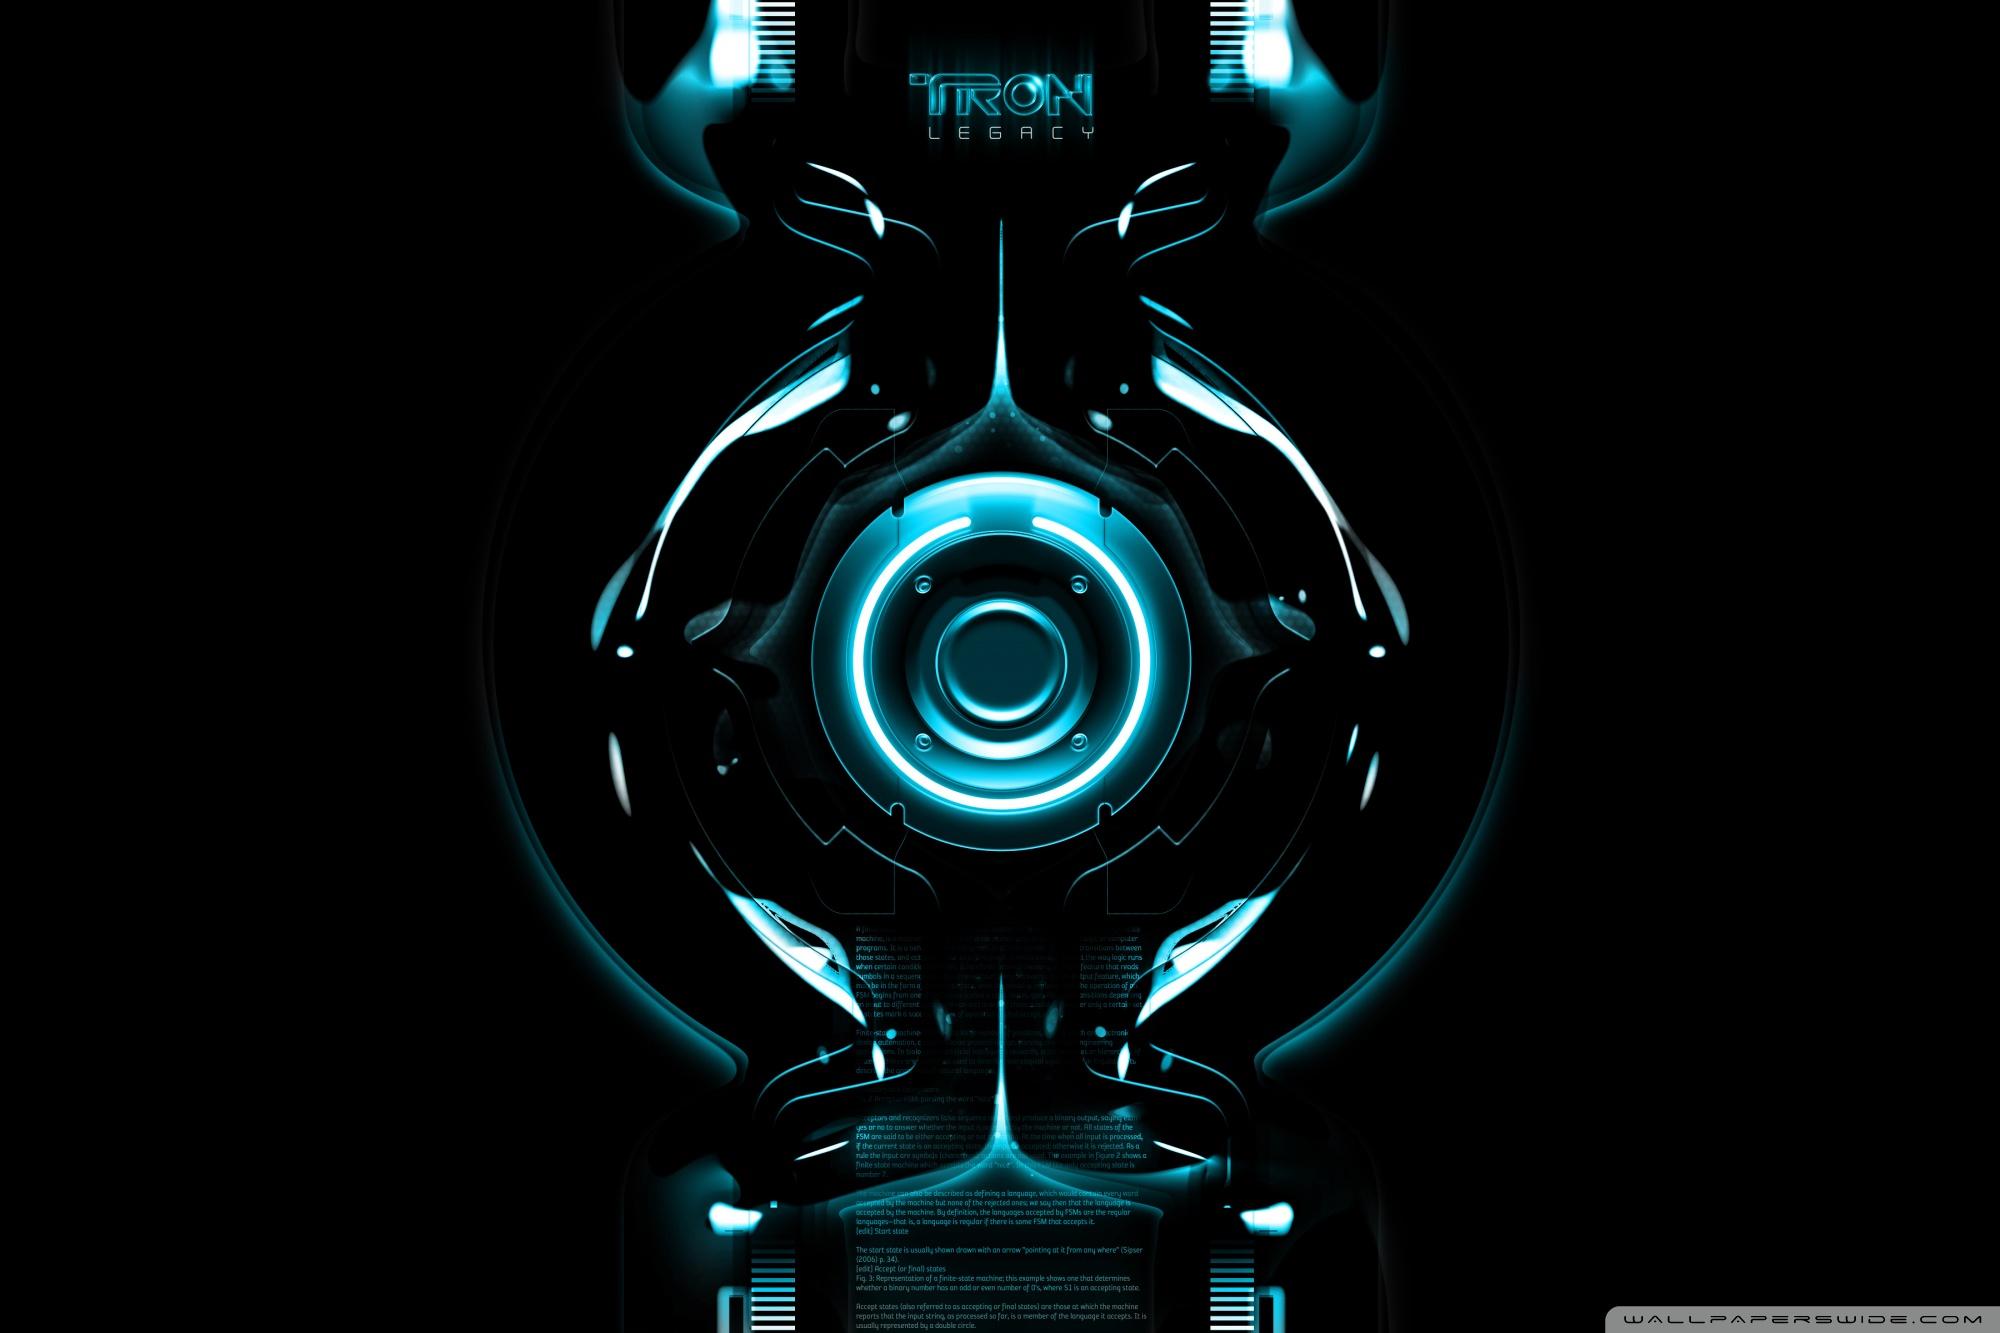 Nike Sb Wallpapers Hd X Jeep Logo Wallpaper Iphone Daft Punk Musique Vol 1 467123 Hd Wallpaper Backgrounds Download